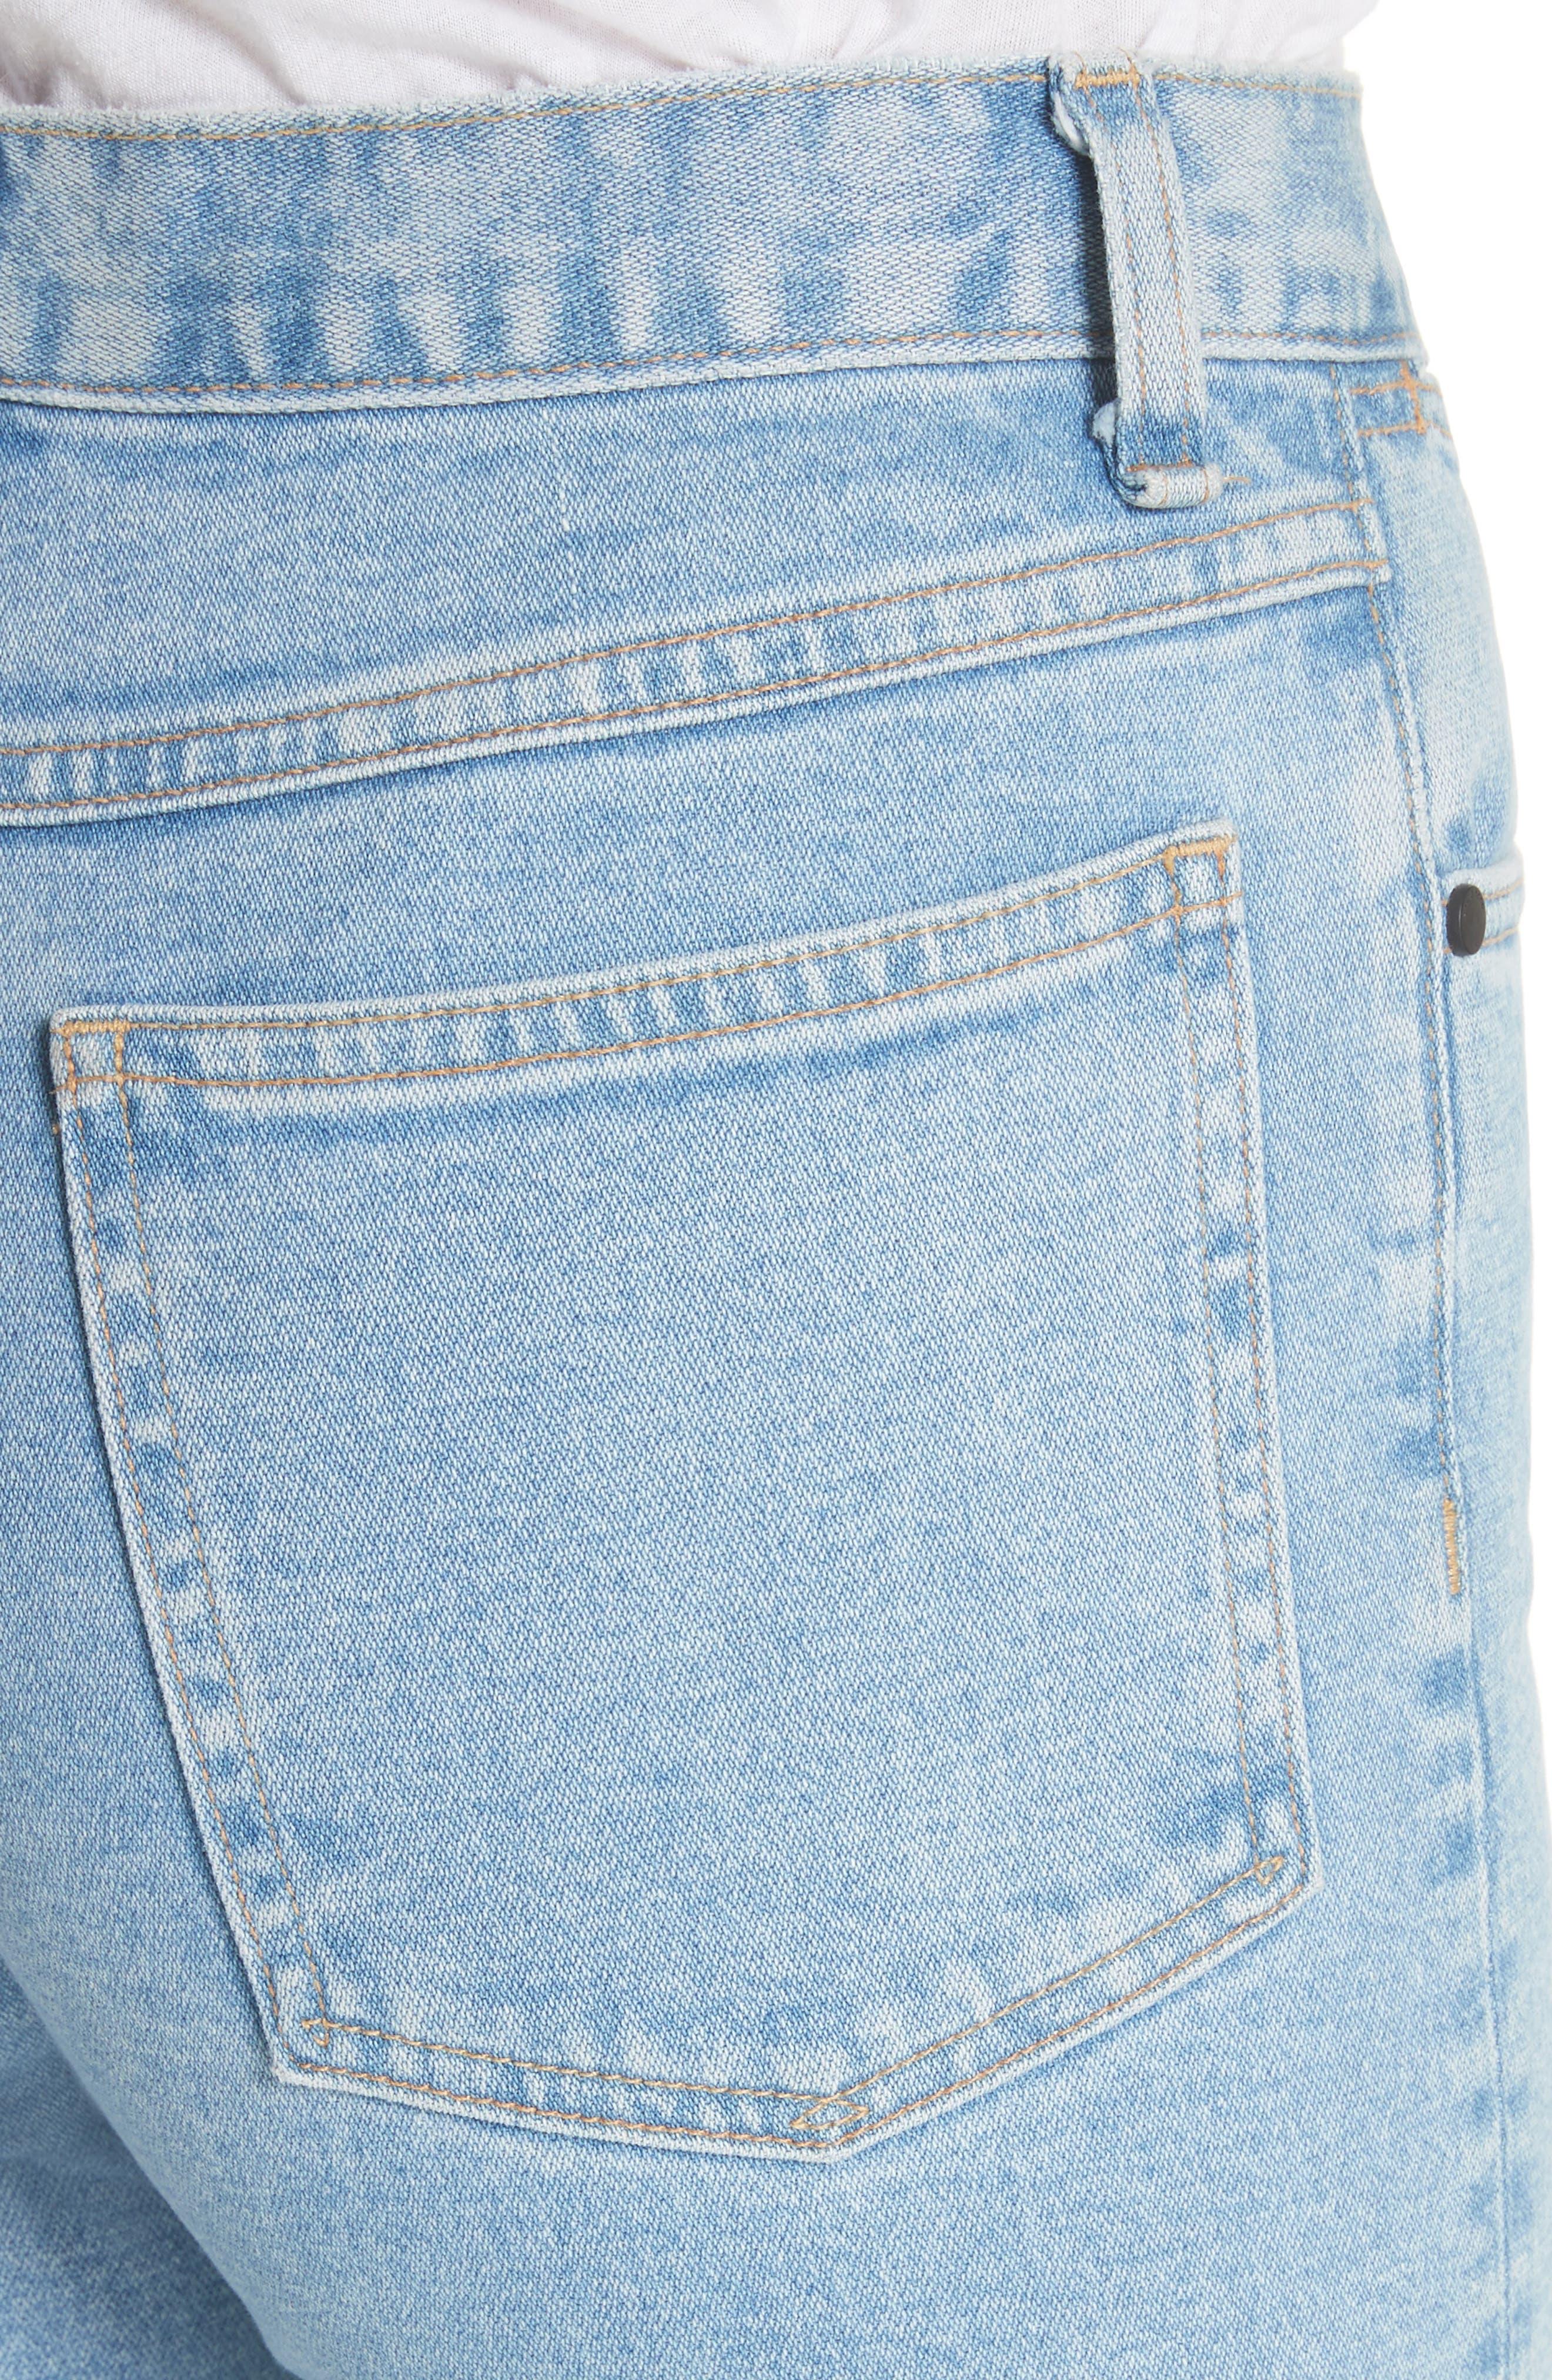 Justine High Waist Wide Leg Trouser Jeans,                             Alternate thumbnail 4, color,                             Broken Nelly